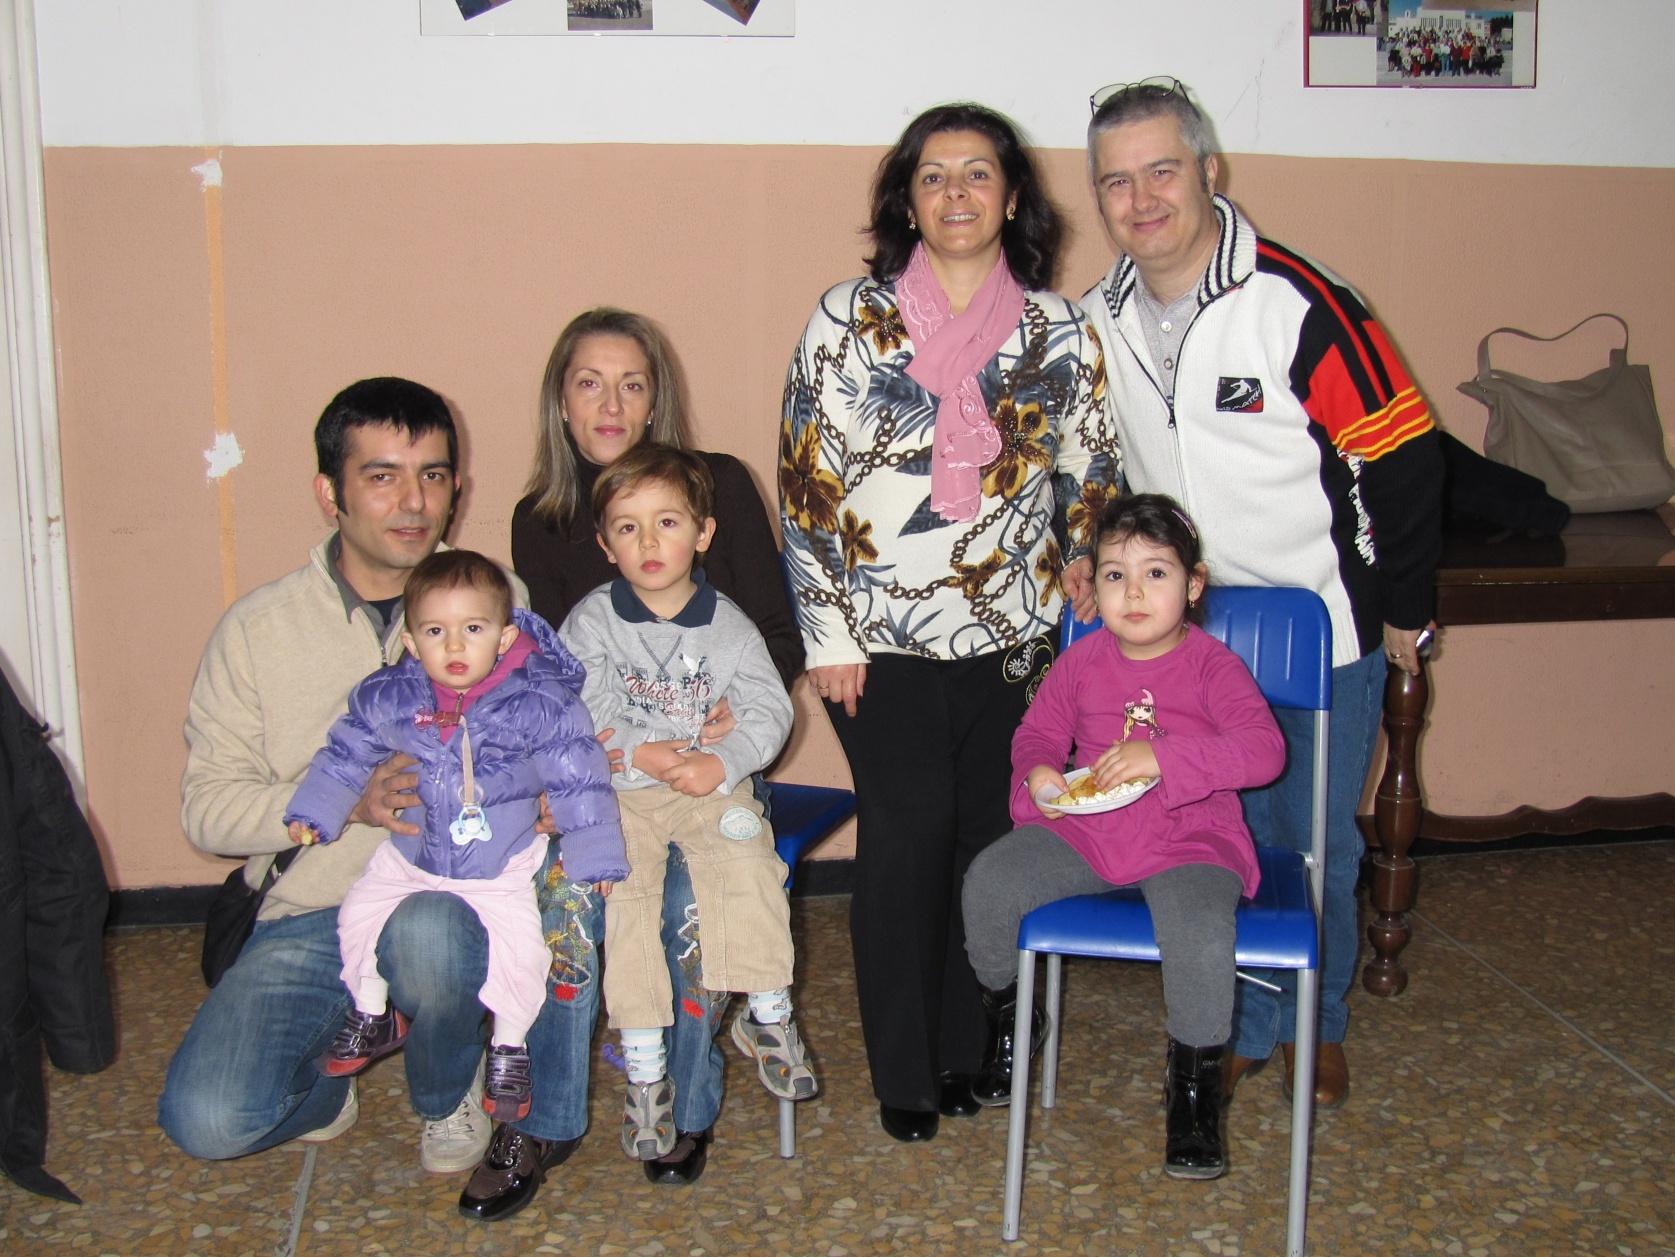 ricordo_battesimo_gesu_2011-01-23-16-44-26